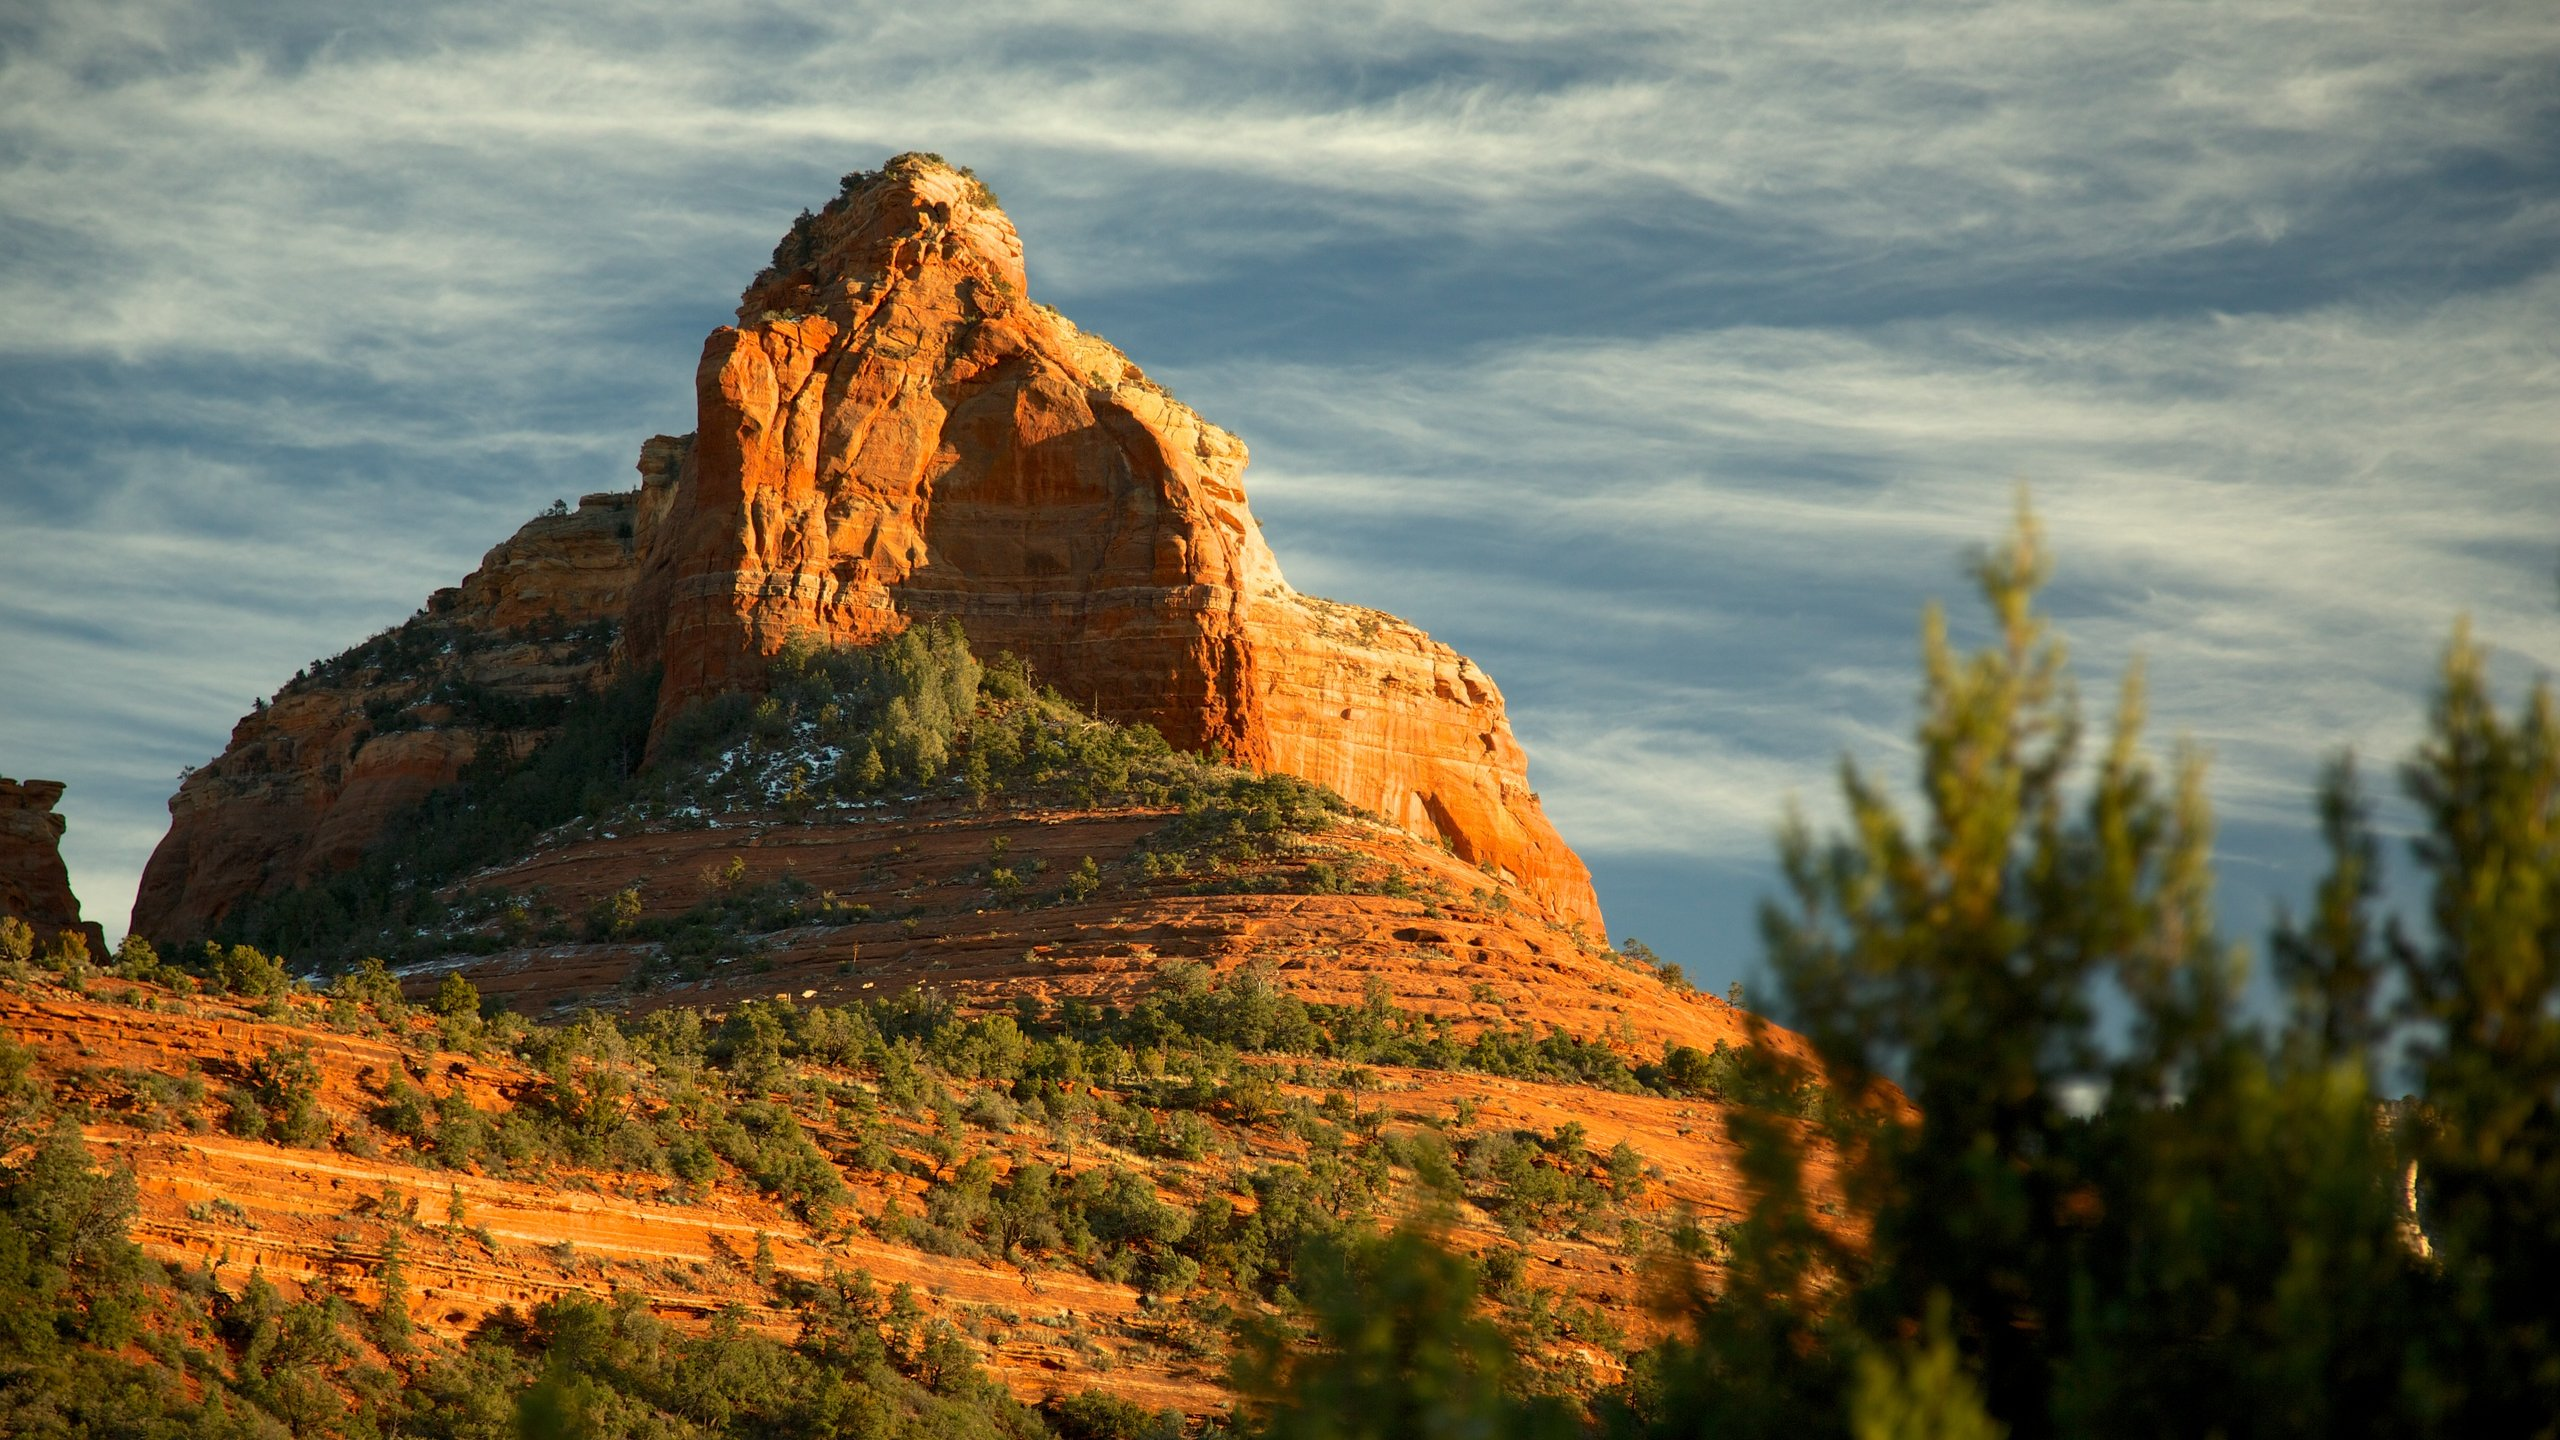 Uptown Sedona, Sedona, Arizona, United States of America